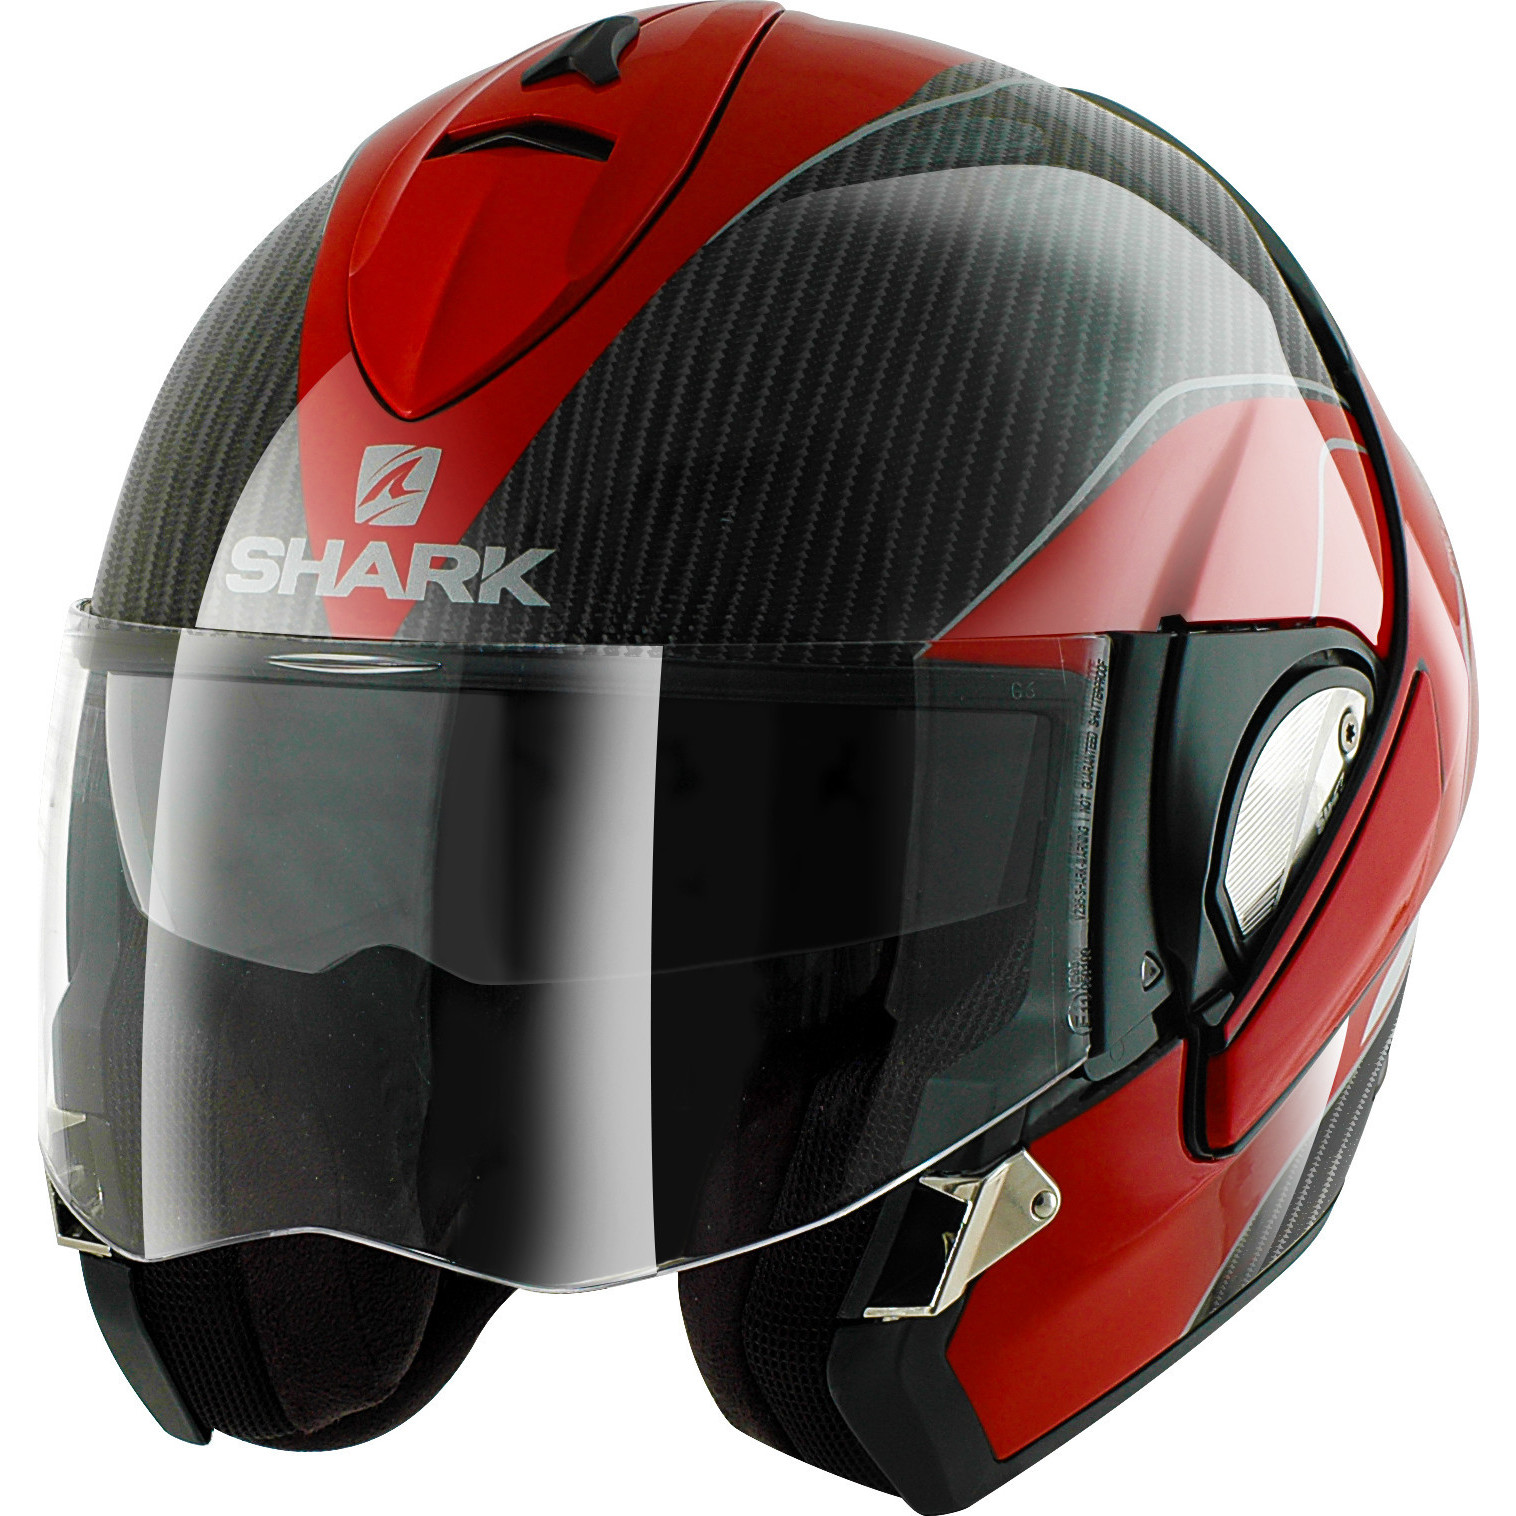 shark evoline pro carbon red white motorcycle helmet drw full open face crash ebay. Black Bedroom Furniture Sets. Home Design Ideas